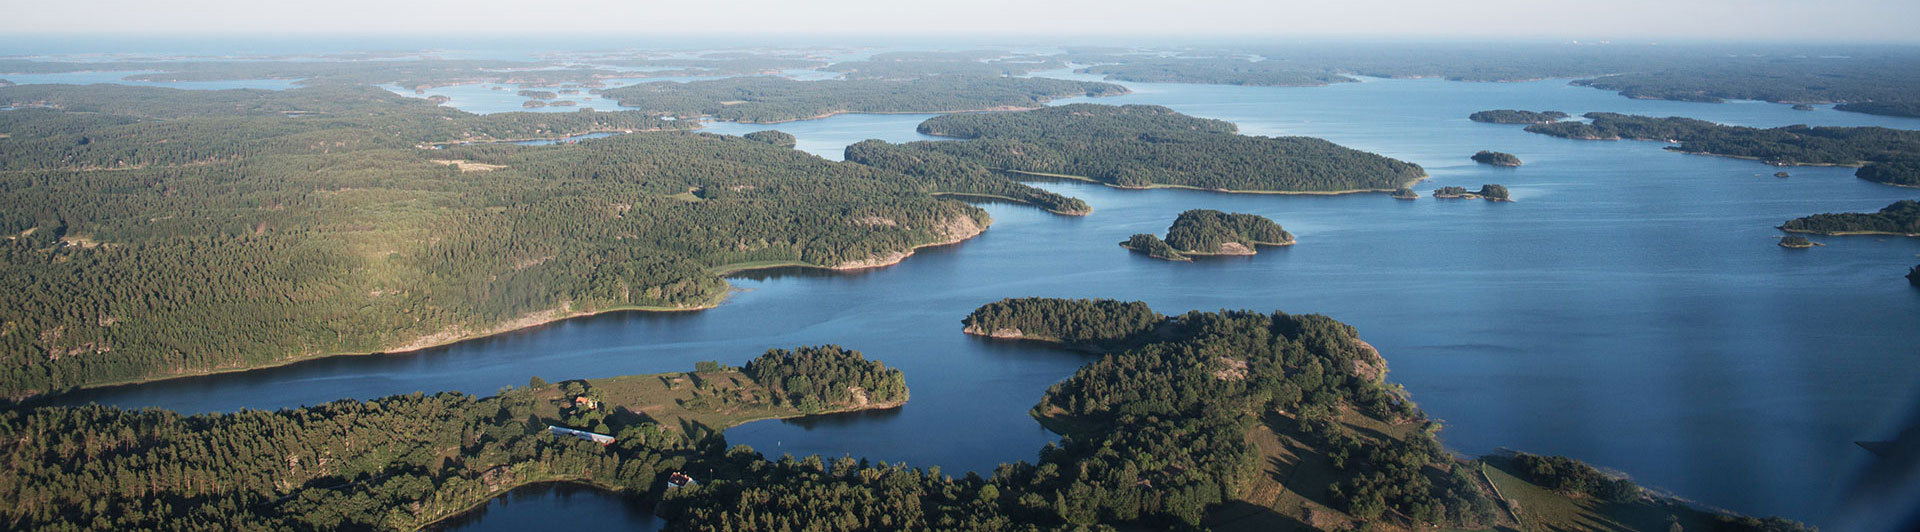 Nordic Resort AB - Ferienhäuser in Schweden - Bjulebo